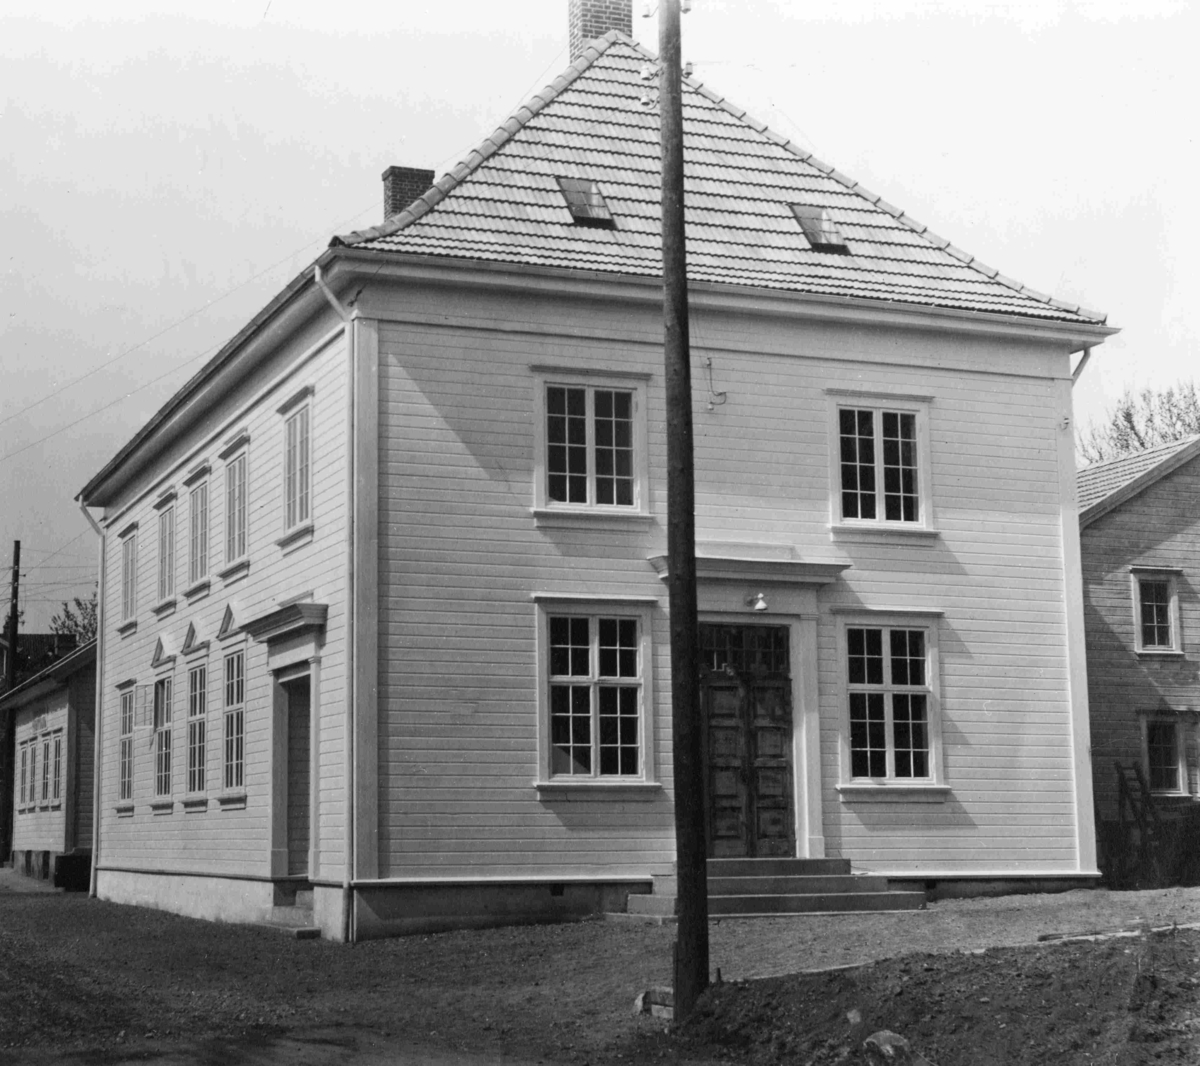 Vestre Moland kommune sitt herredshus på Lofthus